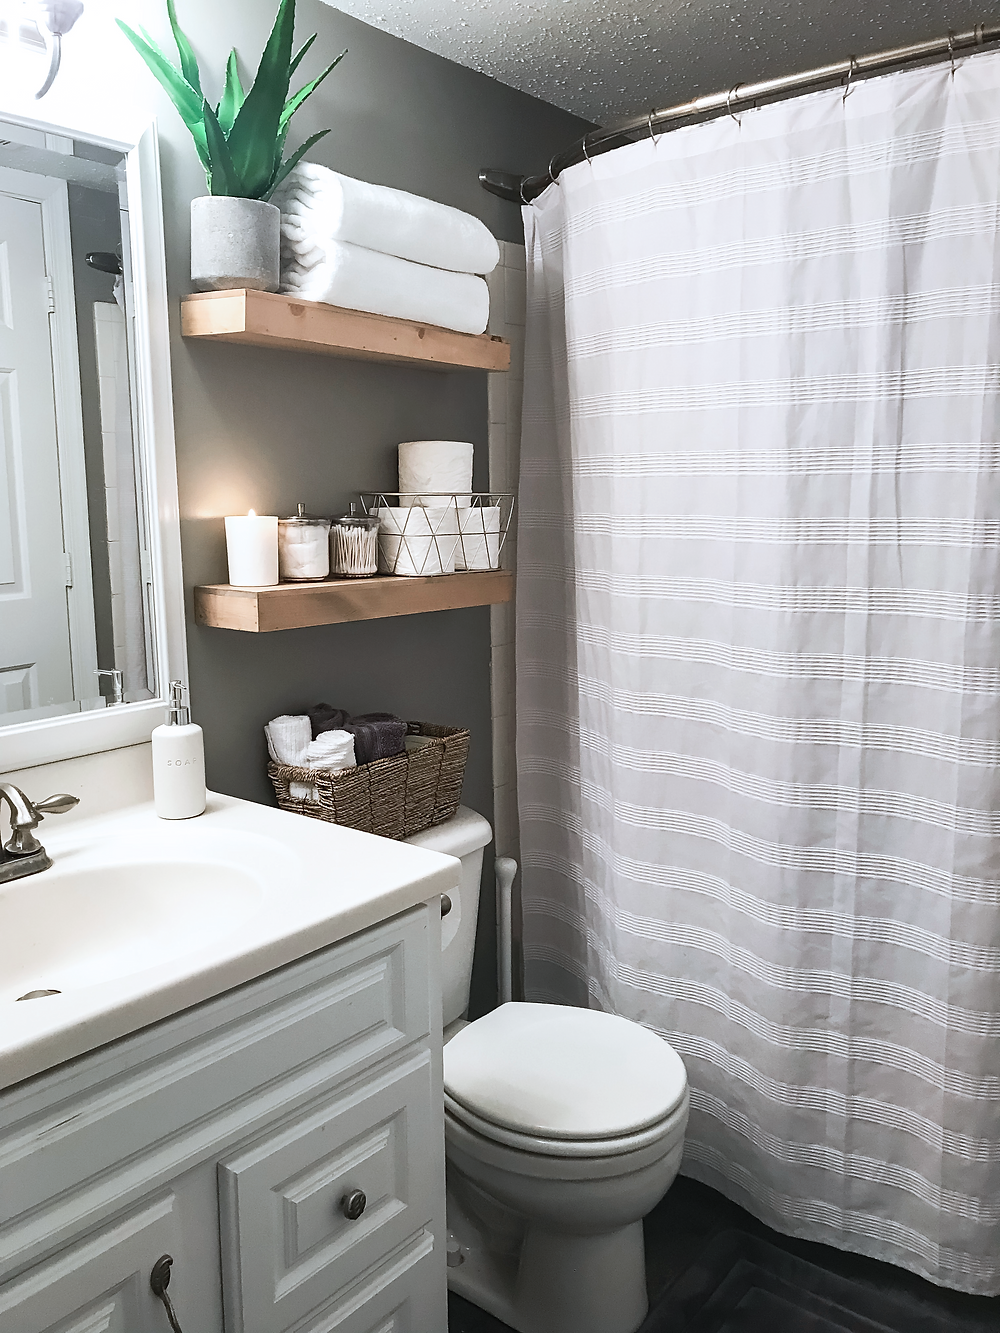 Kaitlynn Stone Easy Way to Upgrade Your Small Rental Bathroom